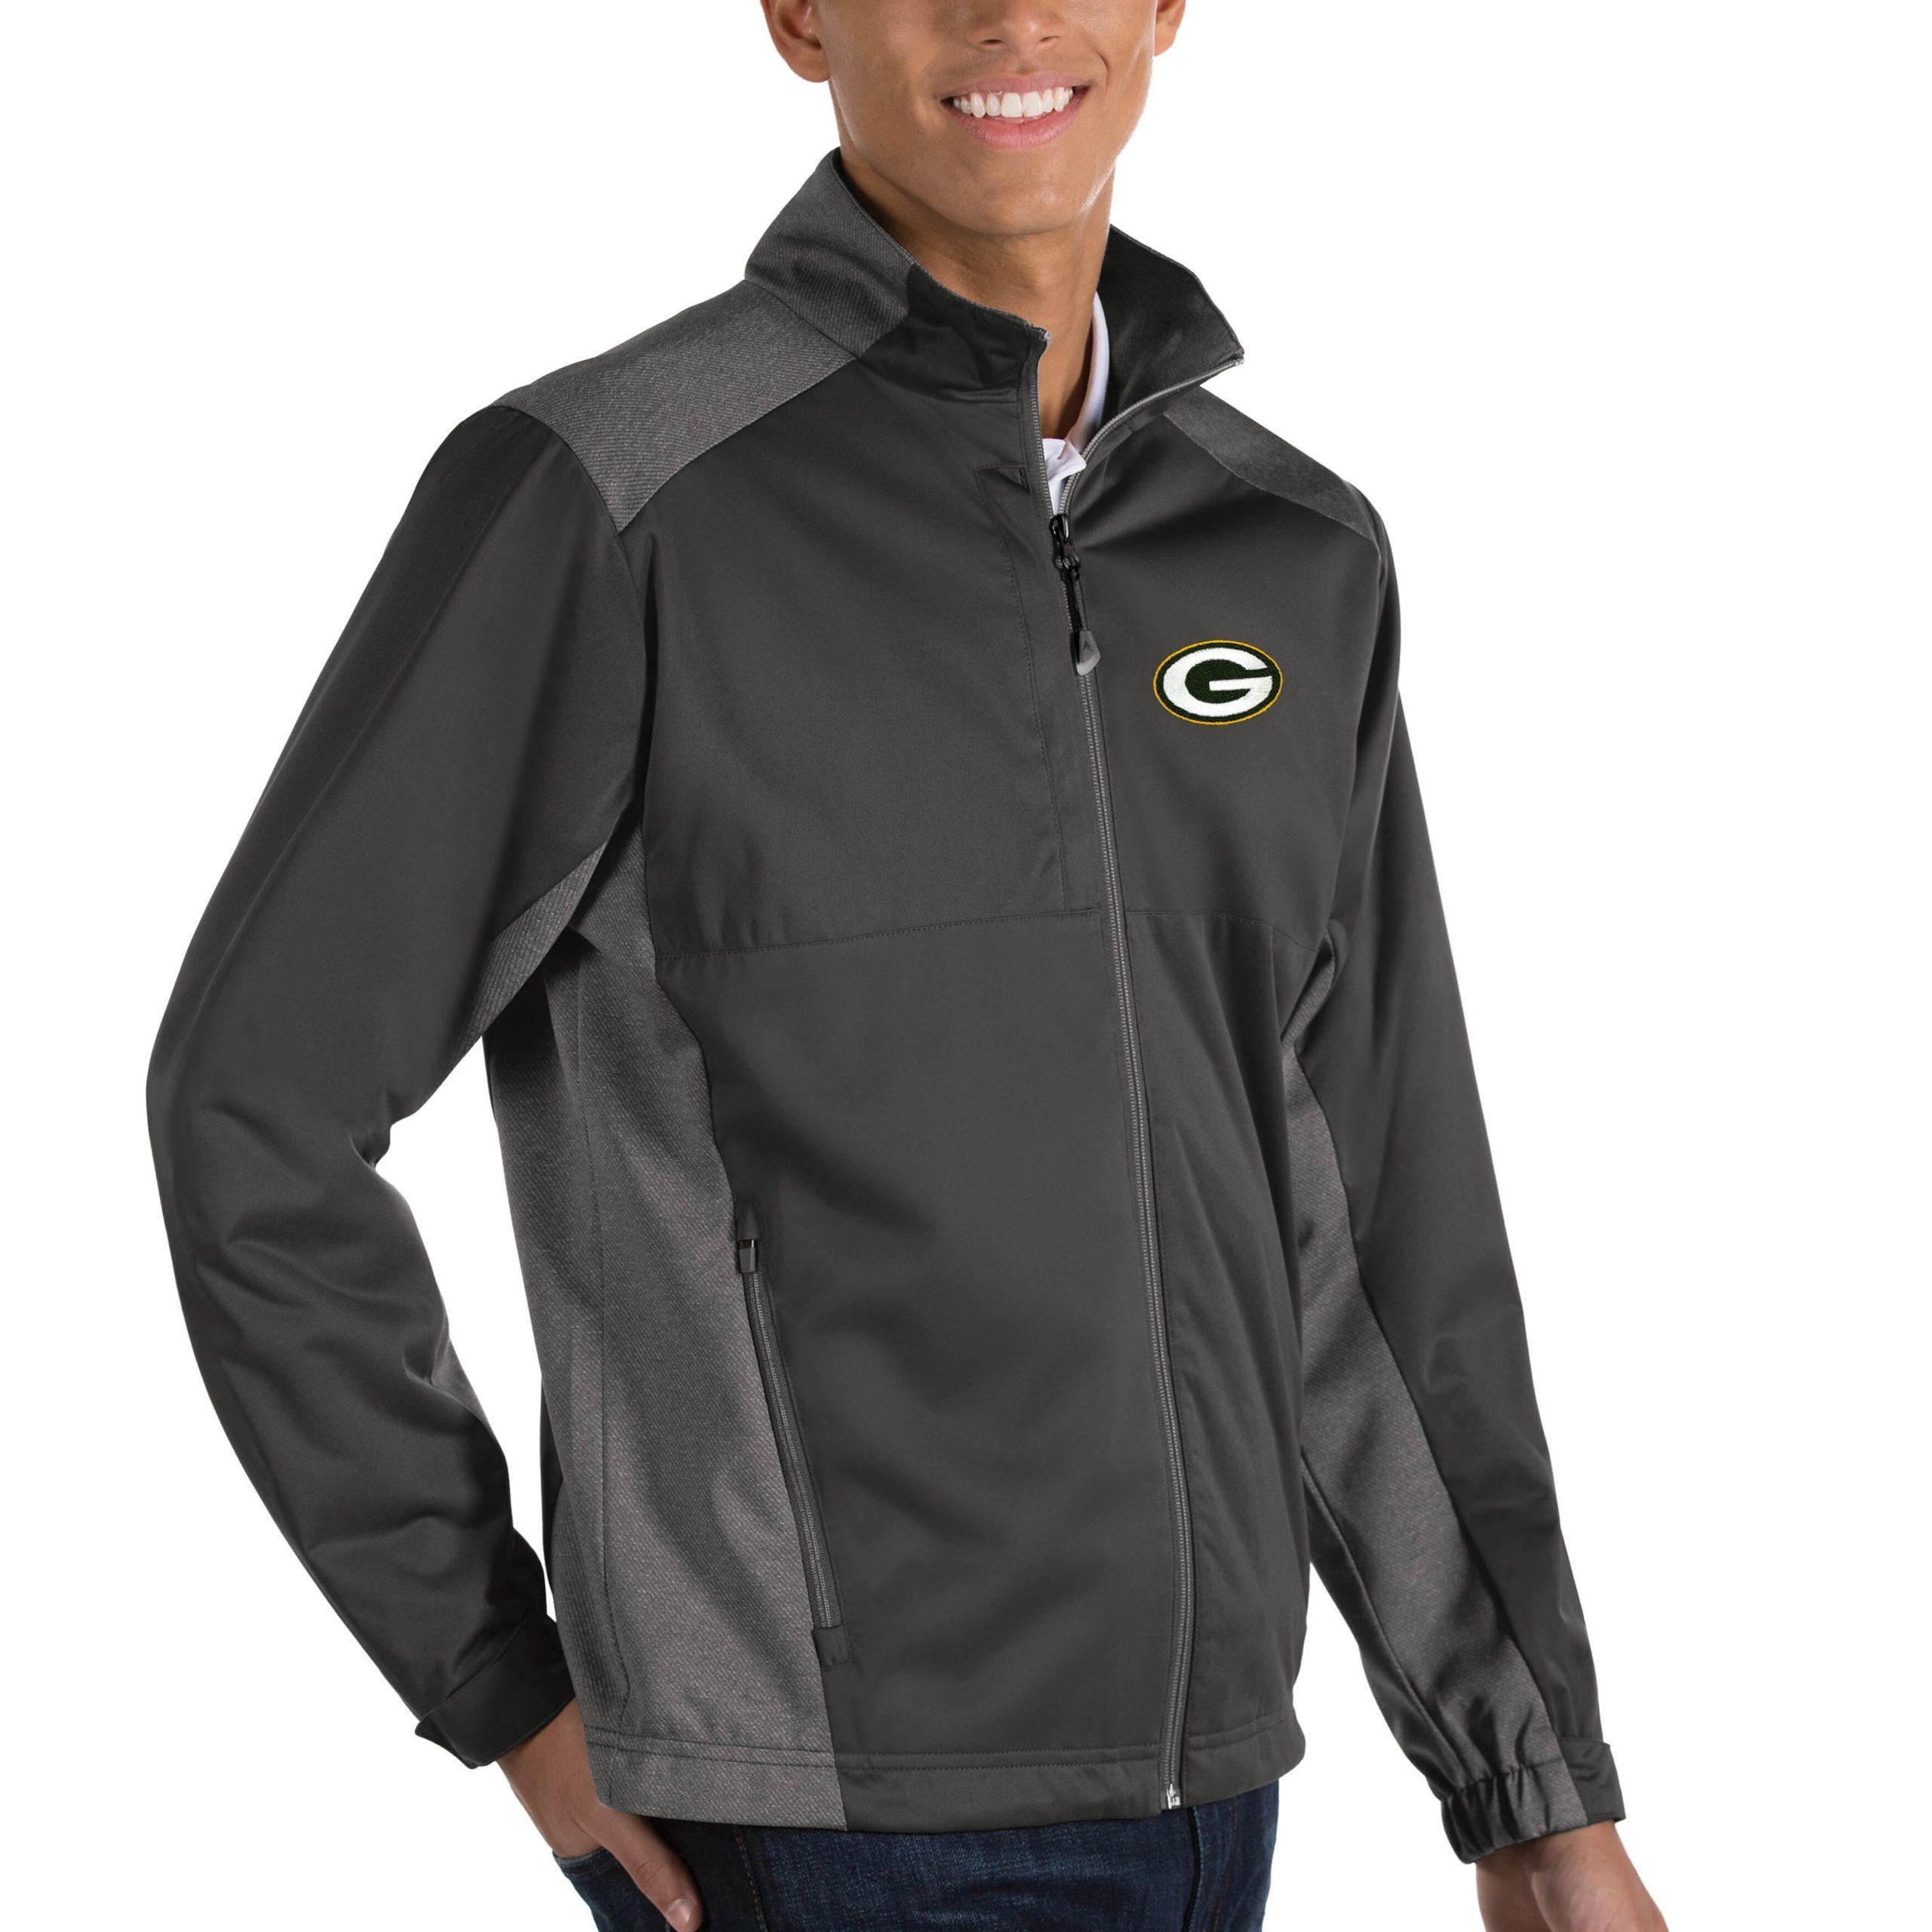 Green Bay Packers Antigua Revolve Big & Tall Full-Zip Jacket - Heather Charcoal